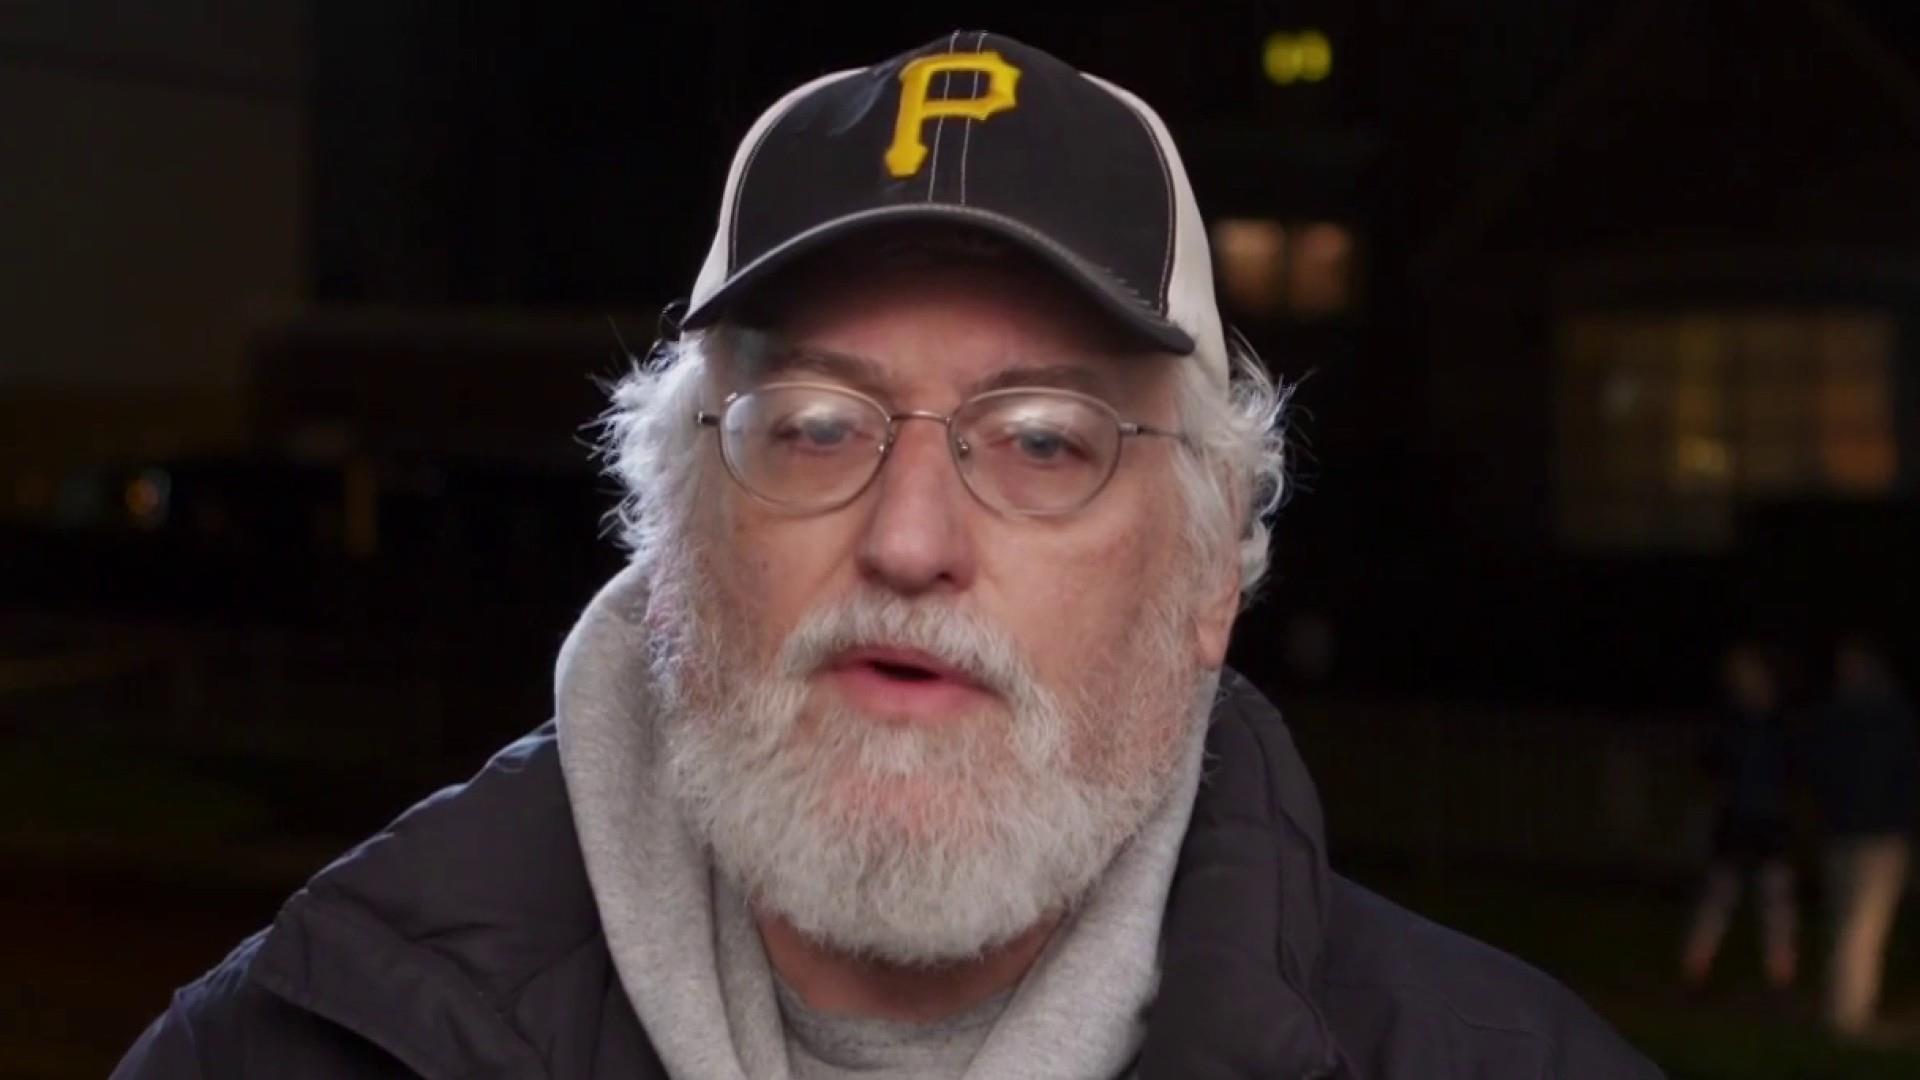 Rabbi to Trump: Wait a week to visit Pittsburgh